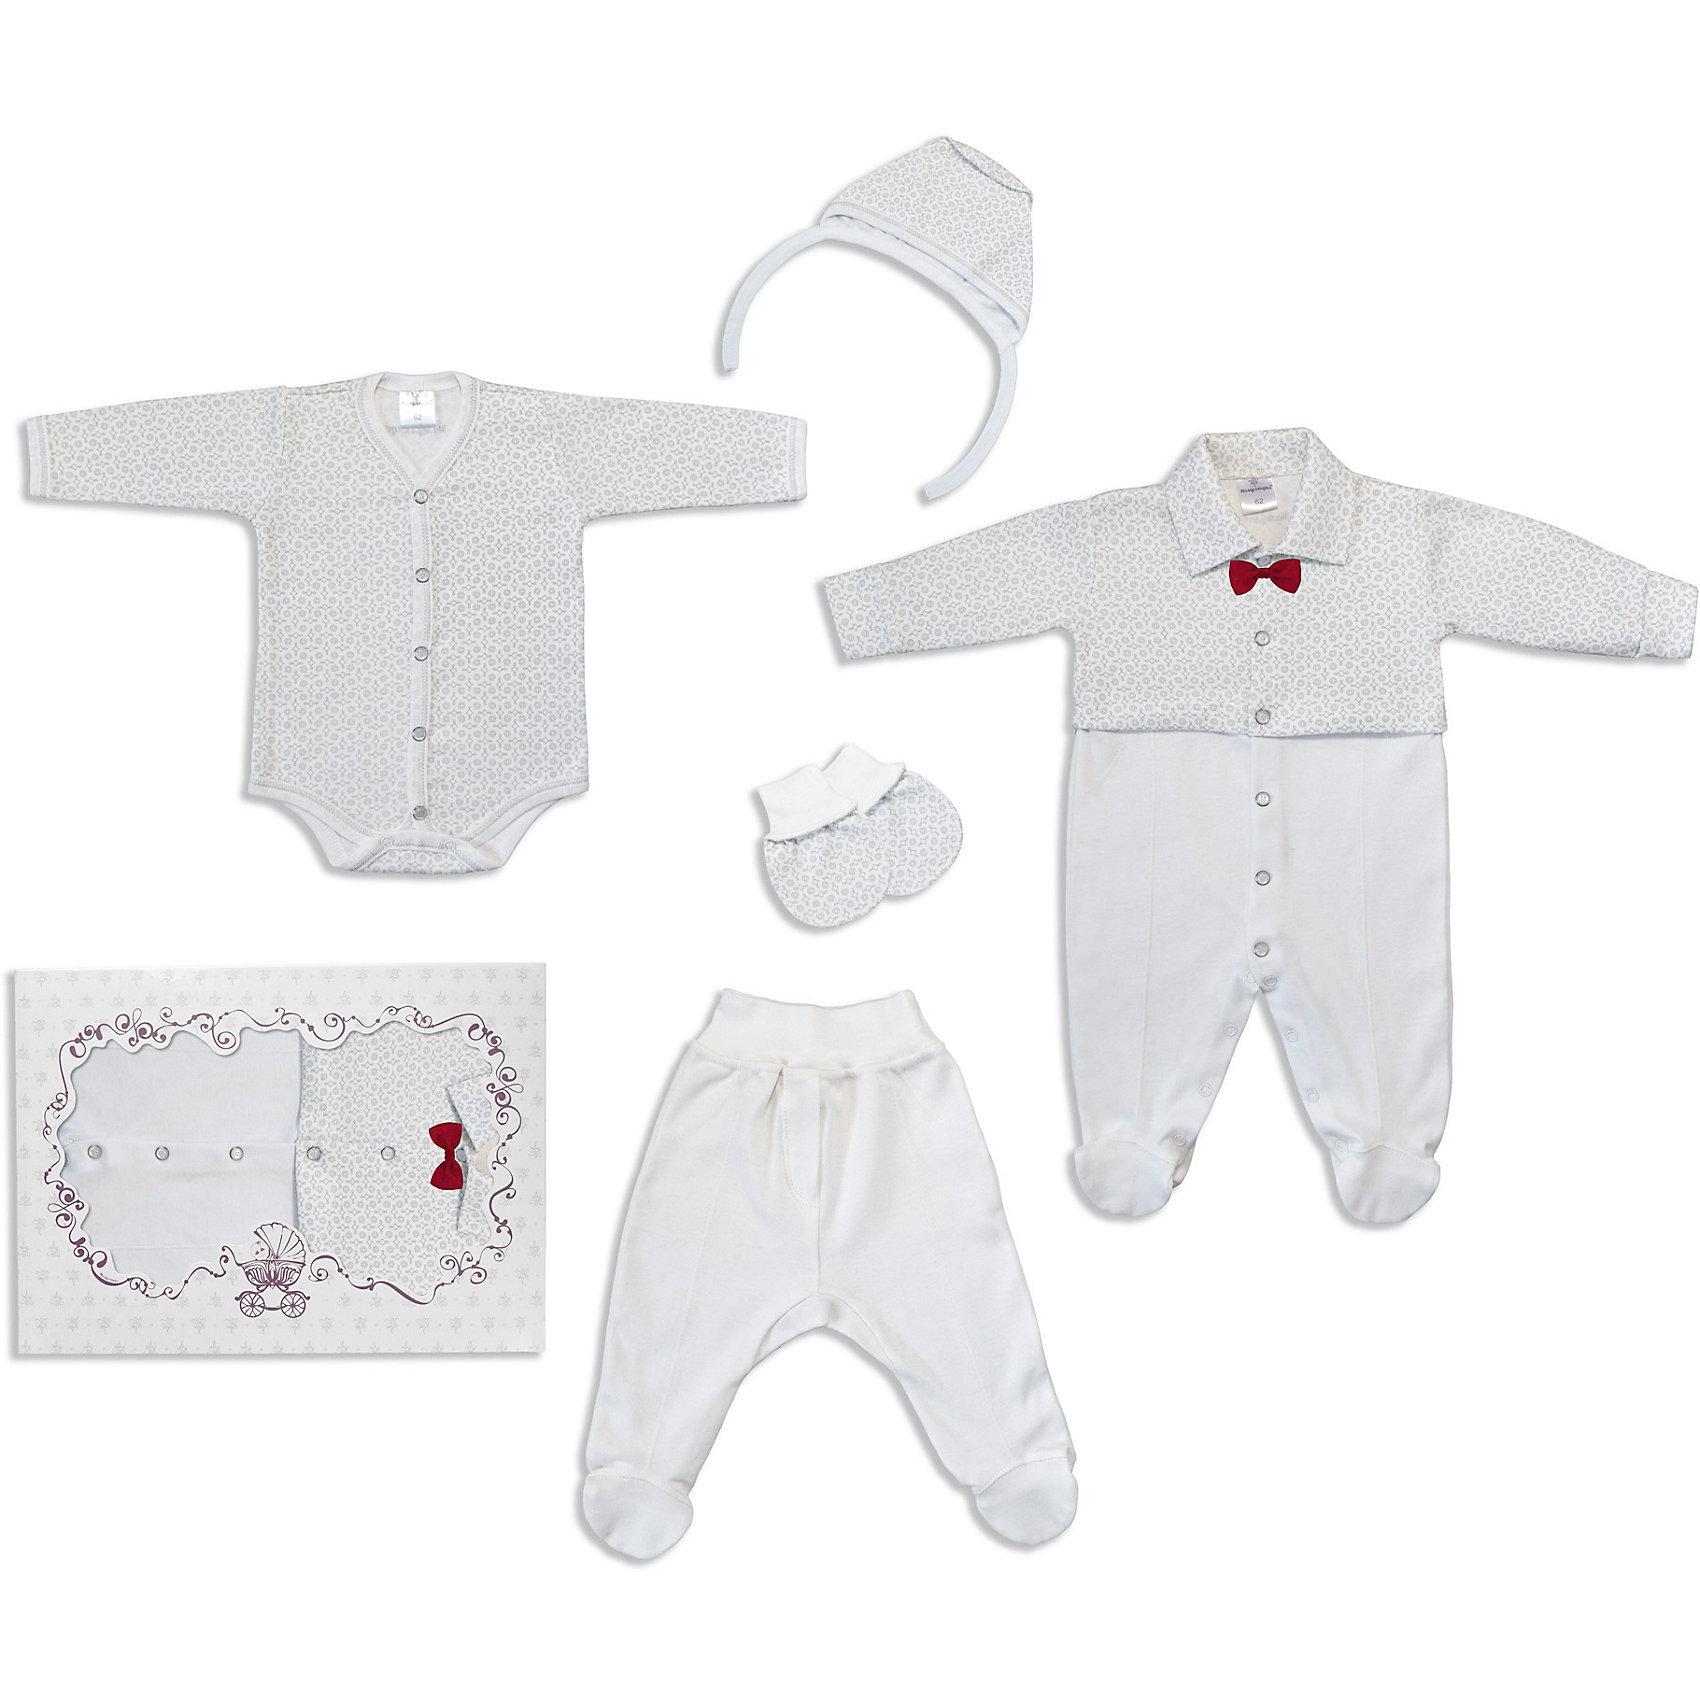 Мамуляндия Комплект для мальчика МАМУЛЯНДИЯ мамуляндия комплект для новорожденного мамуляндия